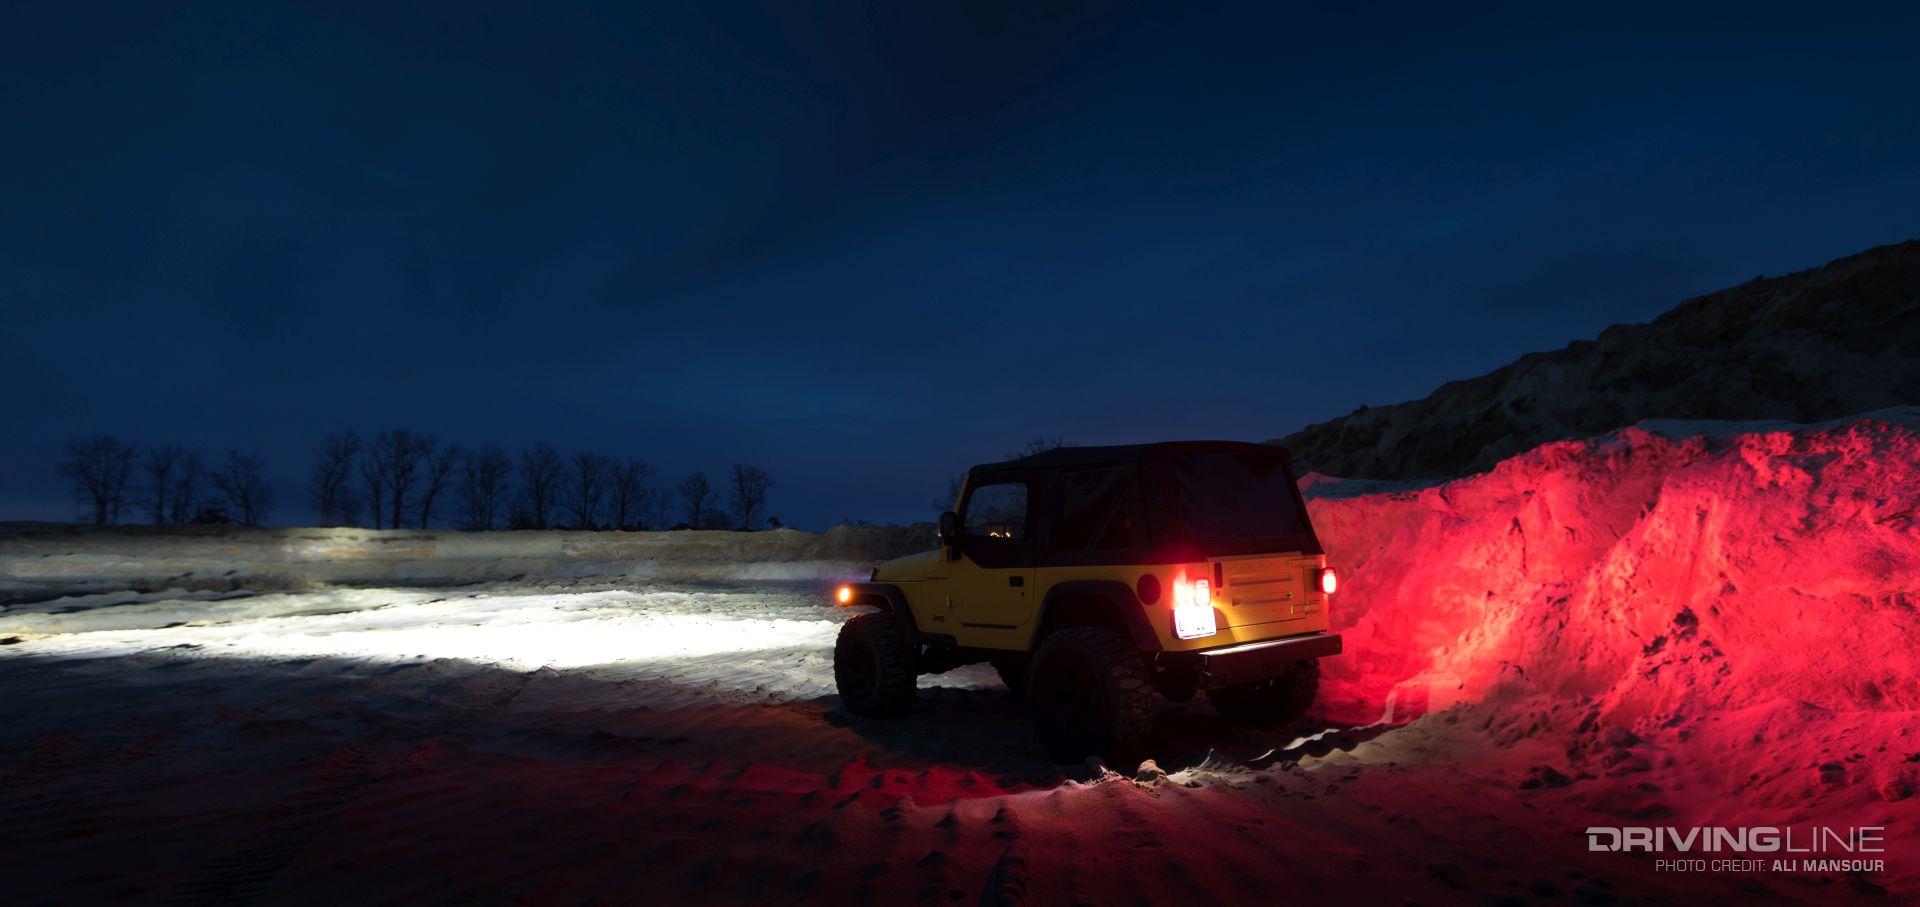 Quadratecs Gen Ii Led Headlight Review Drivingline Jeep Wrangler Tj Reverse Lights